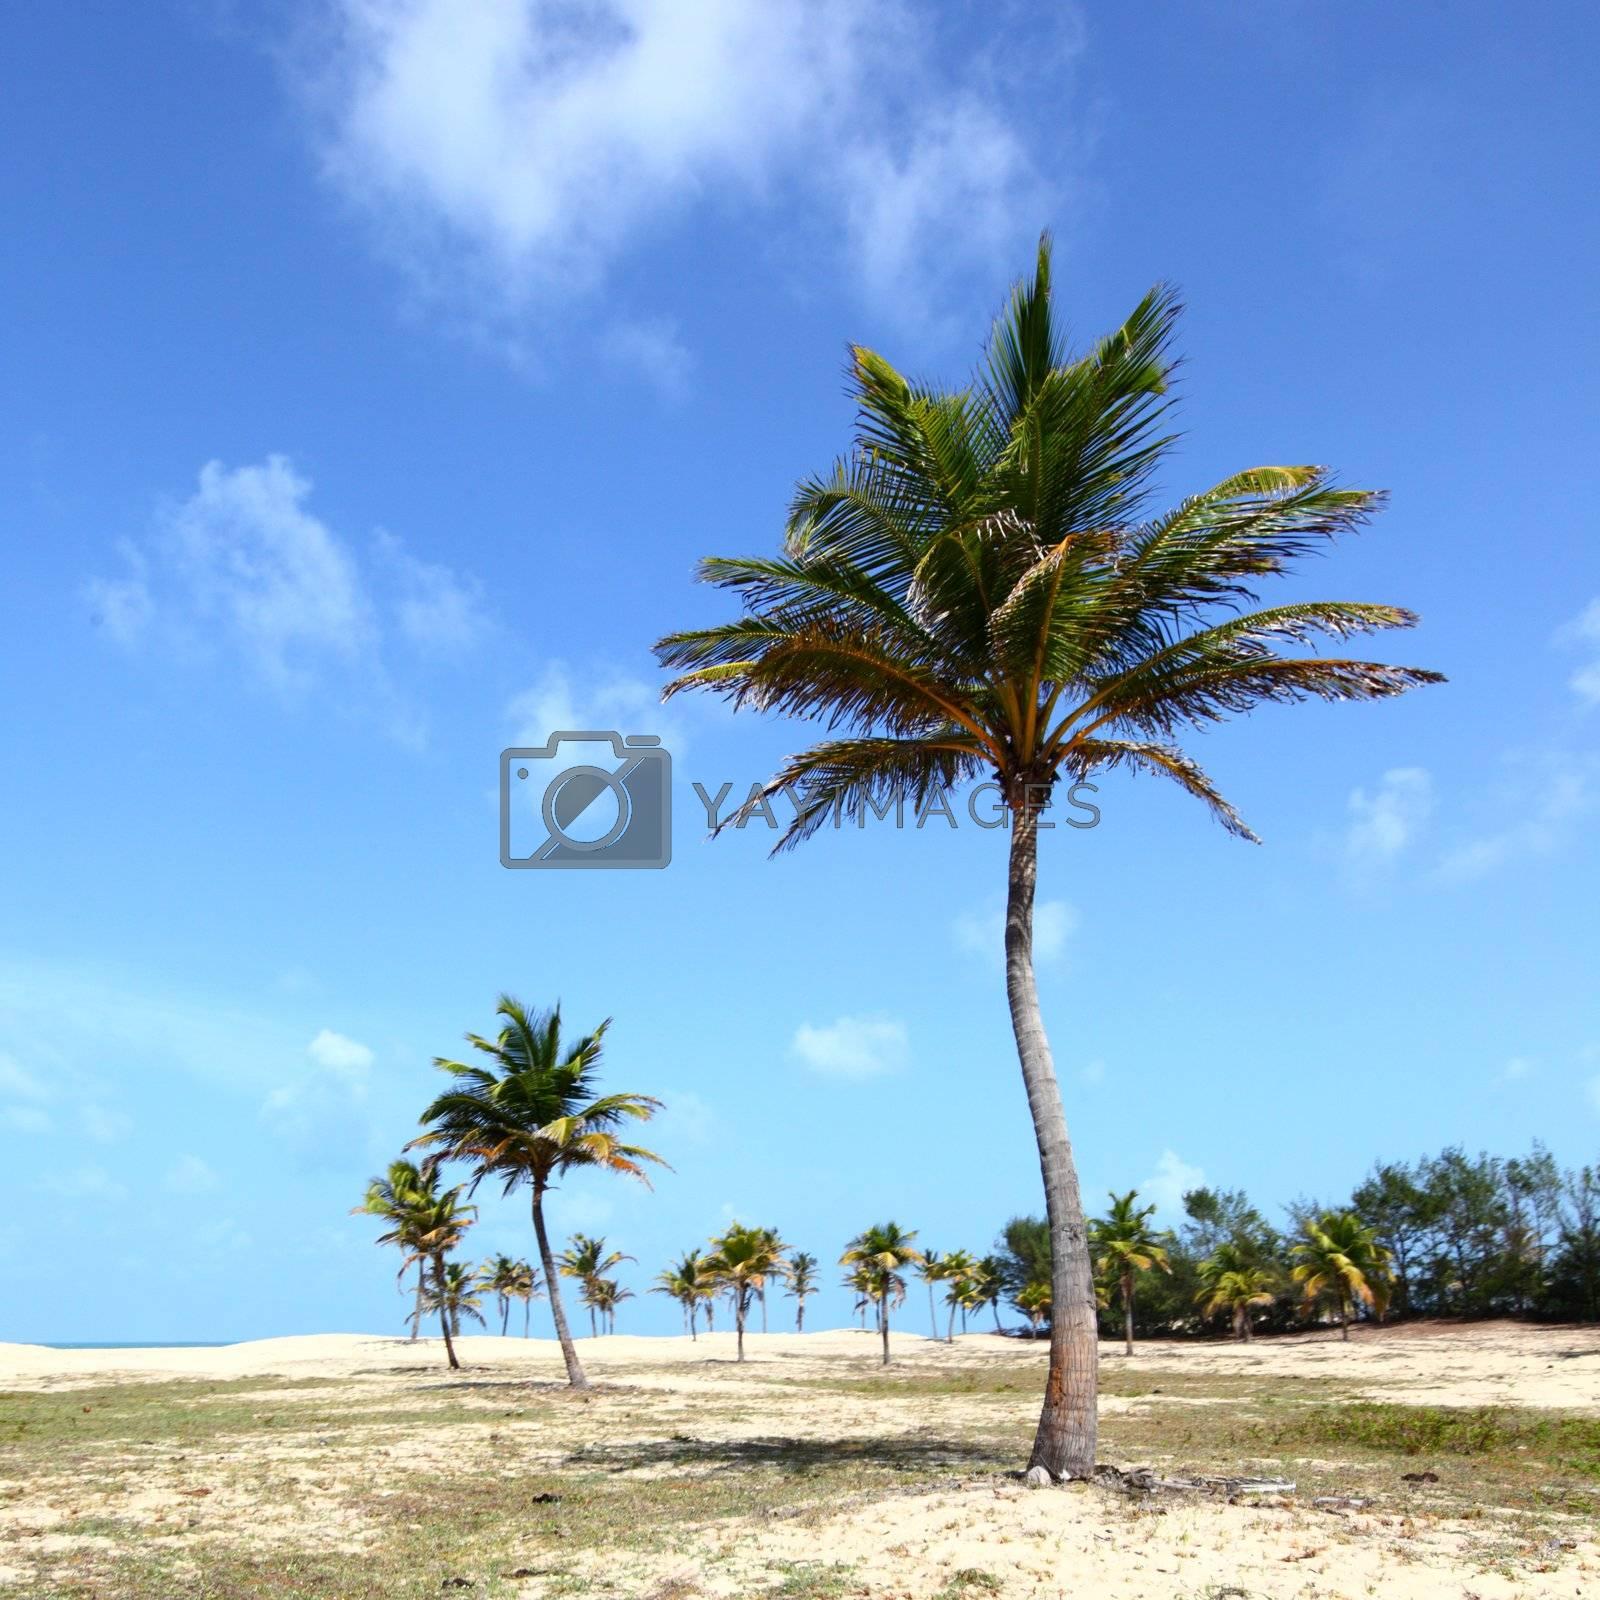 desert palm under blue sunny sky